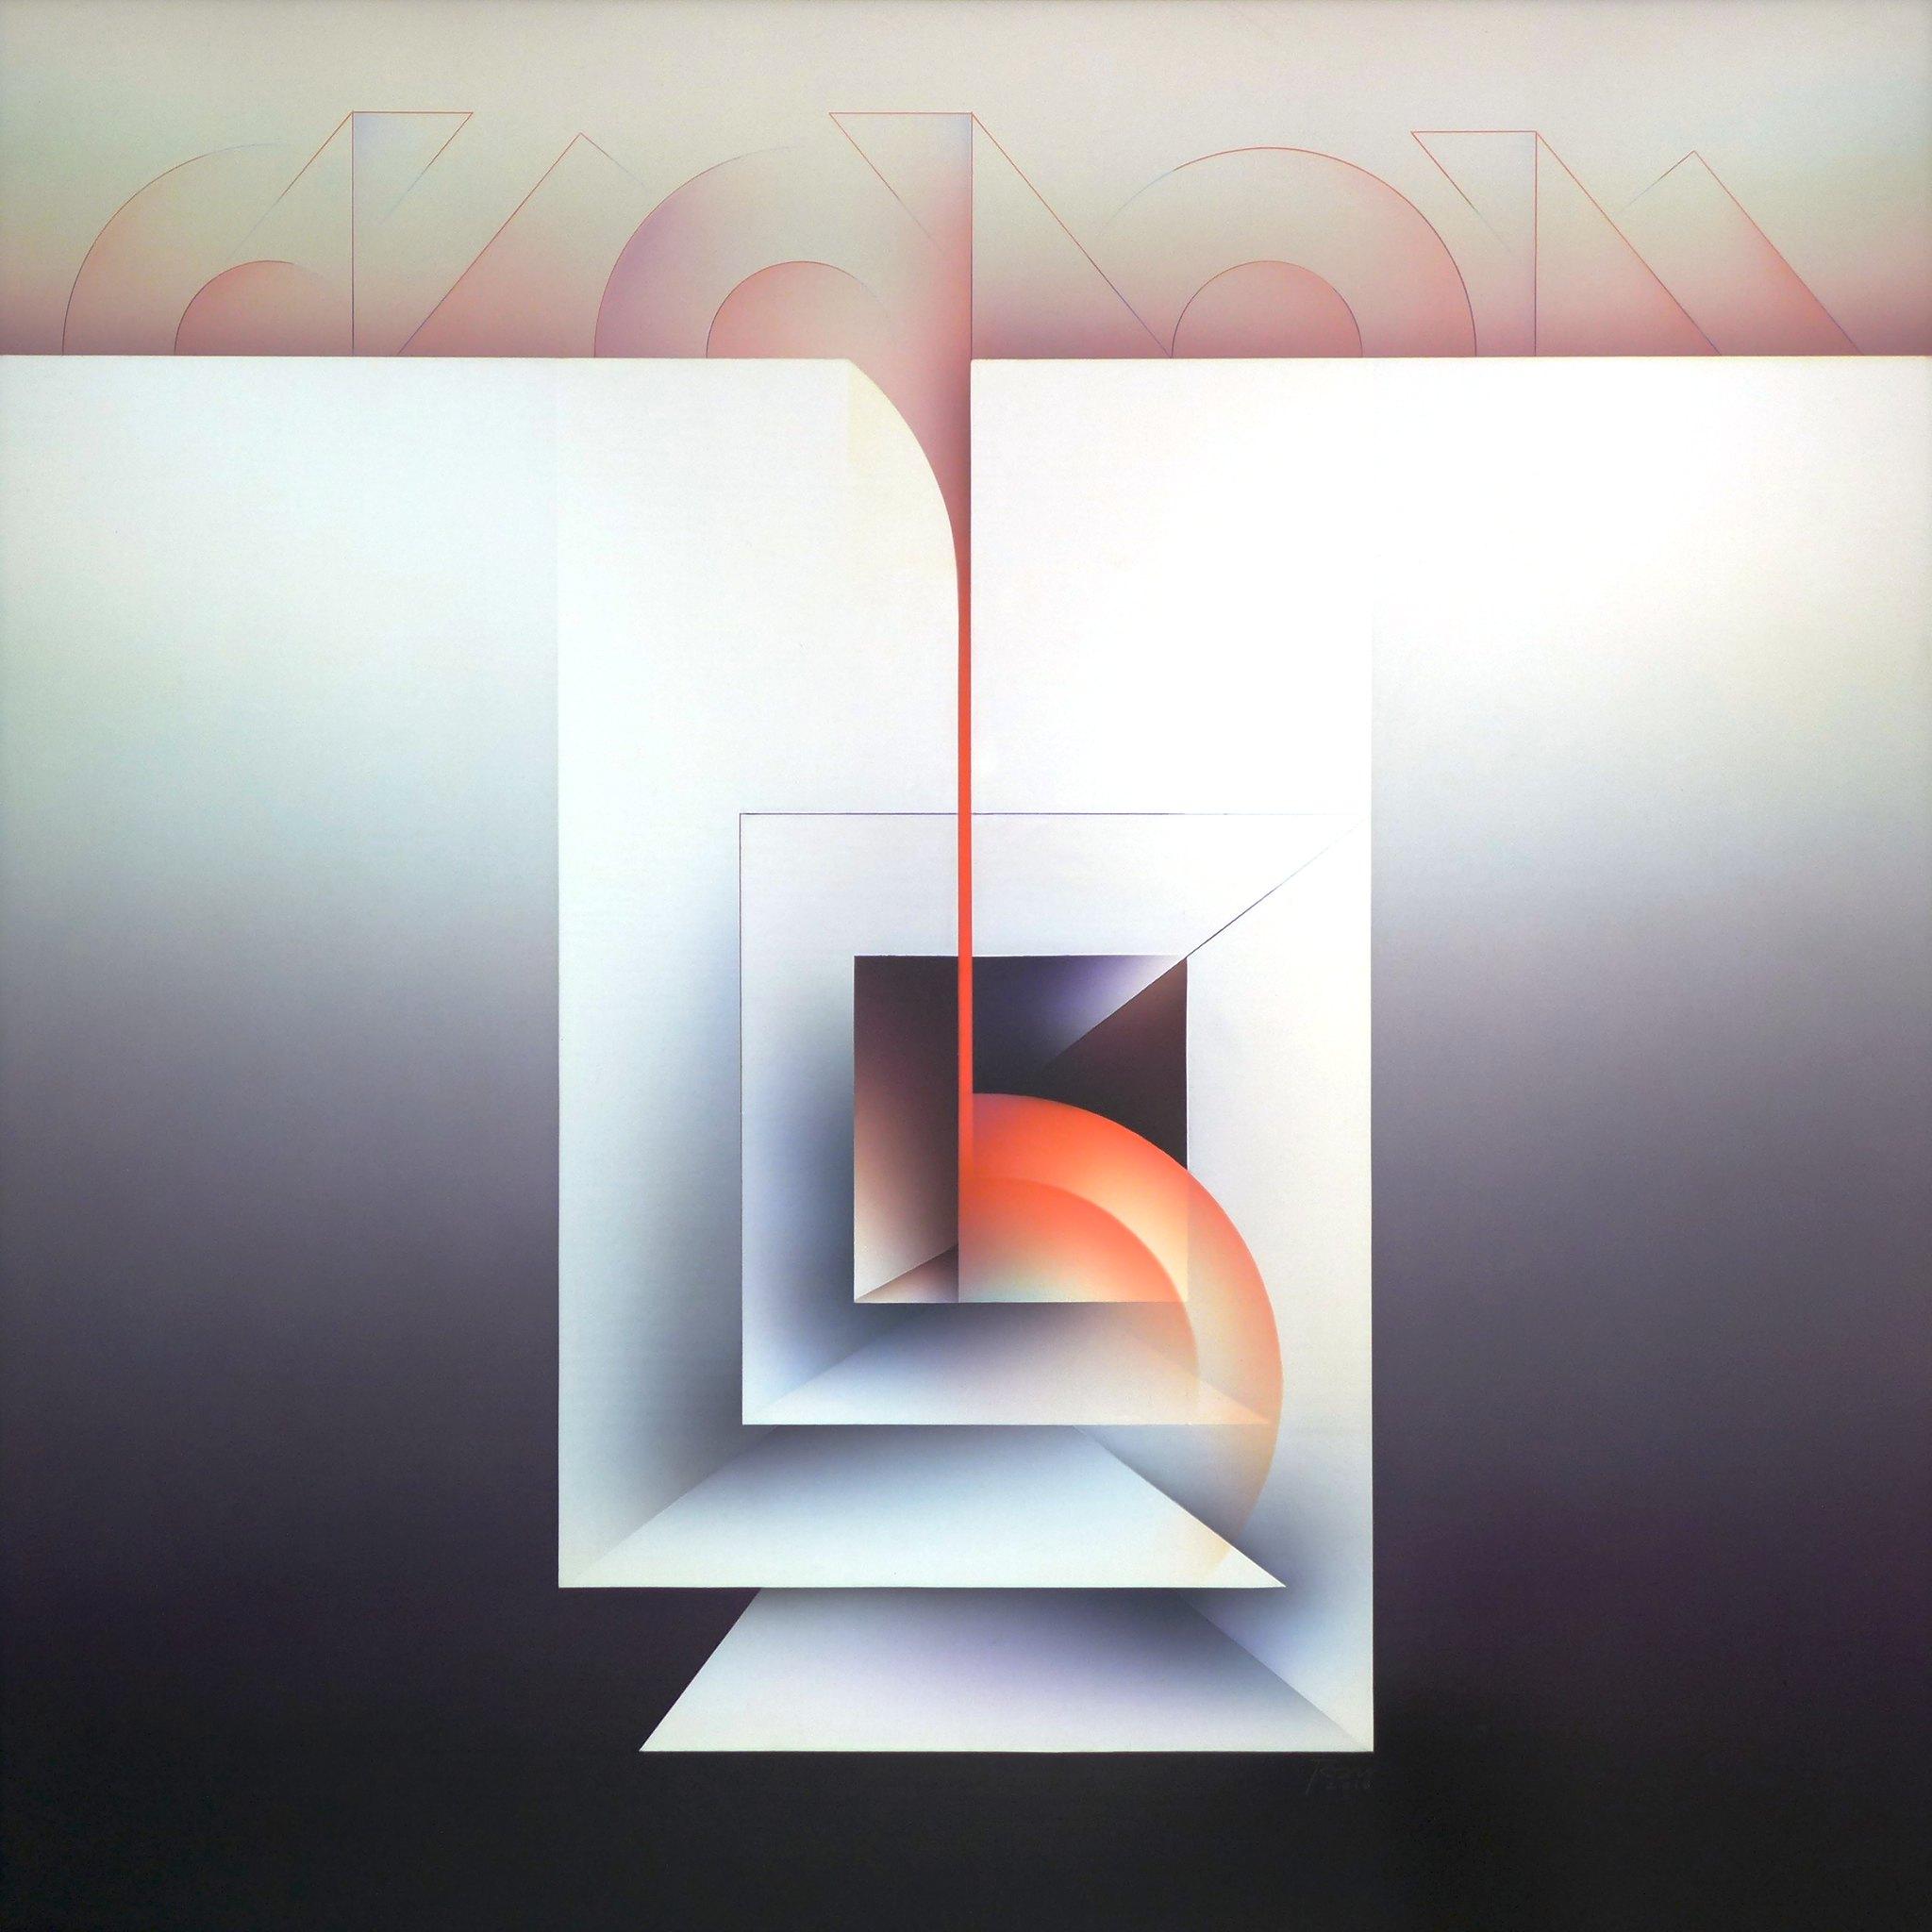 Prims II Exhibit by Rodolfo Gan